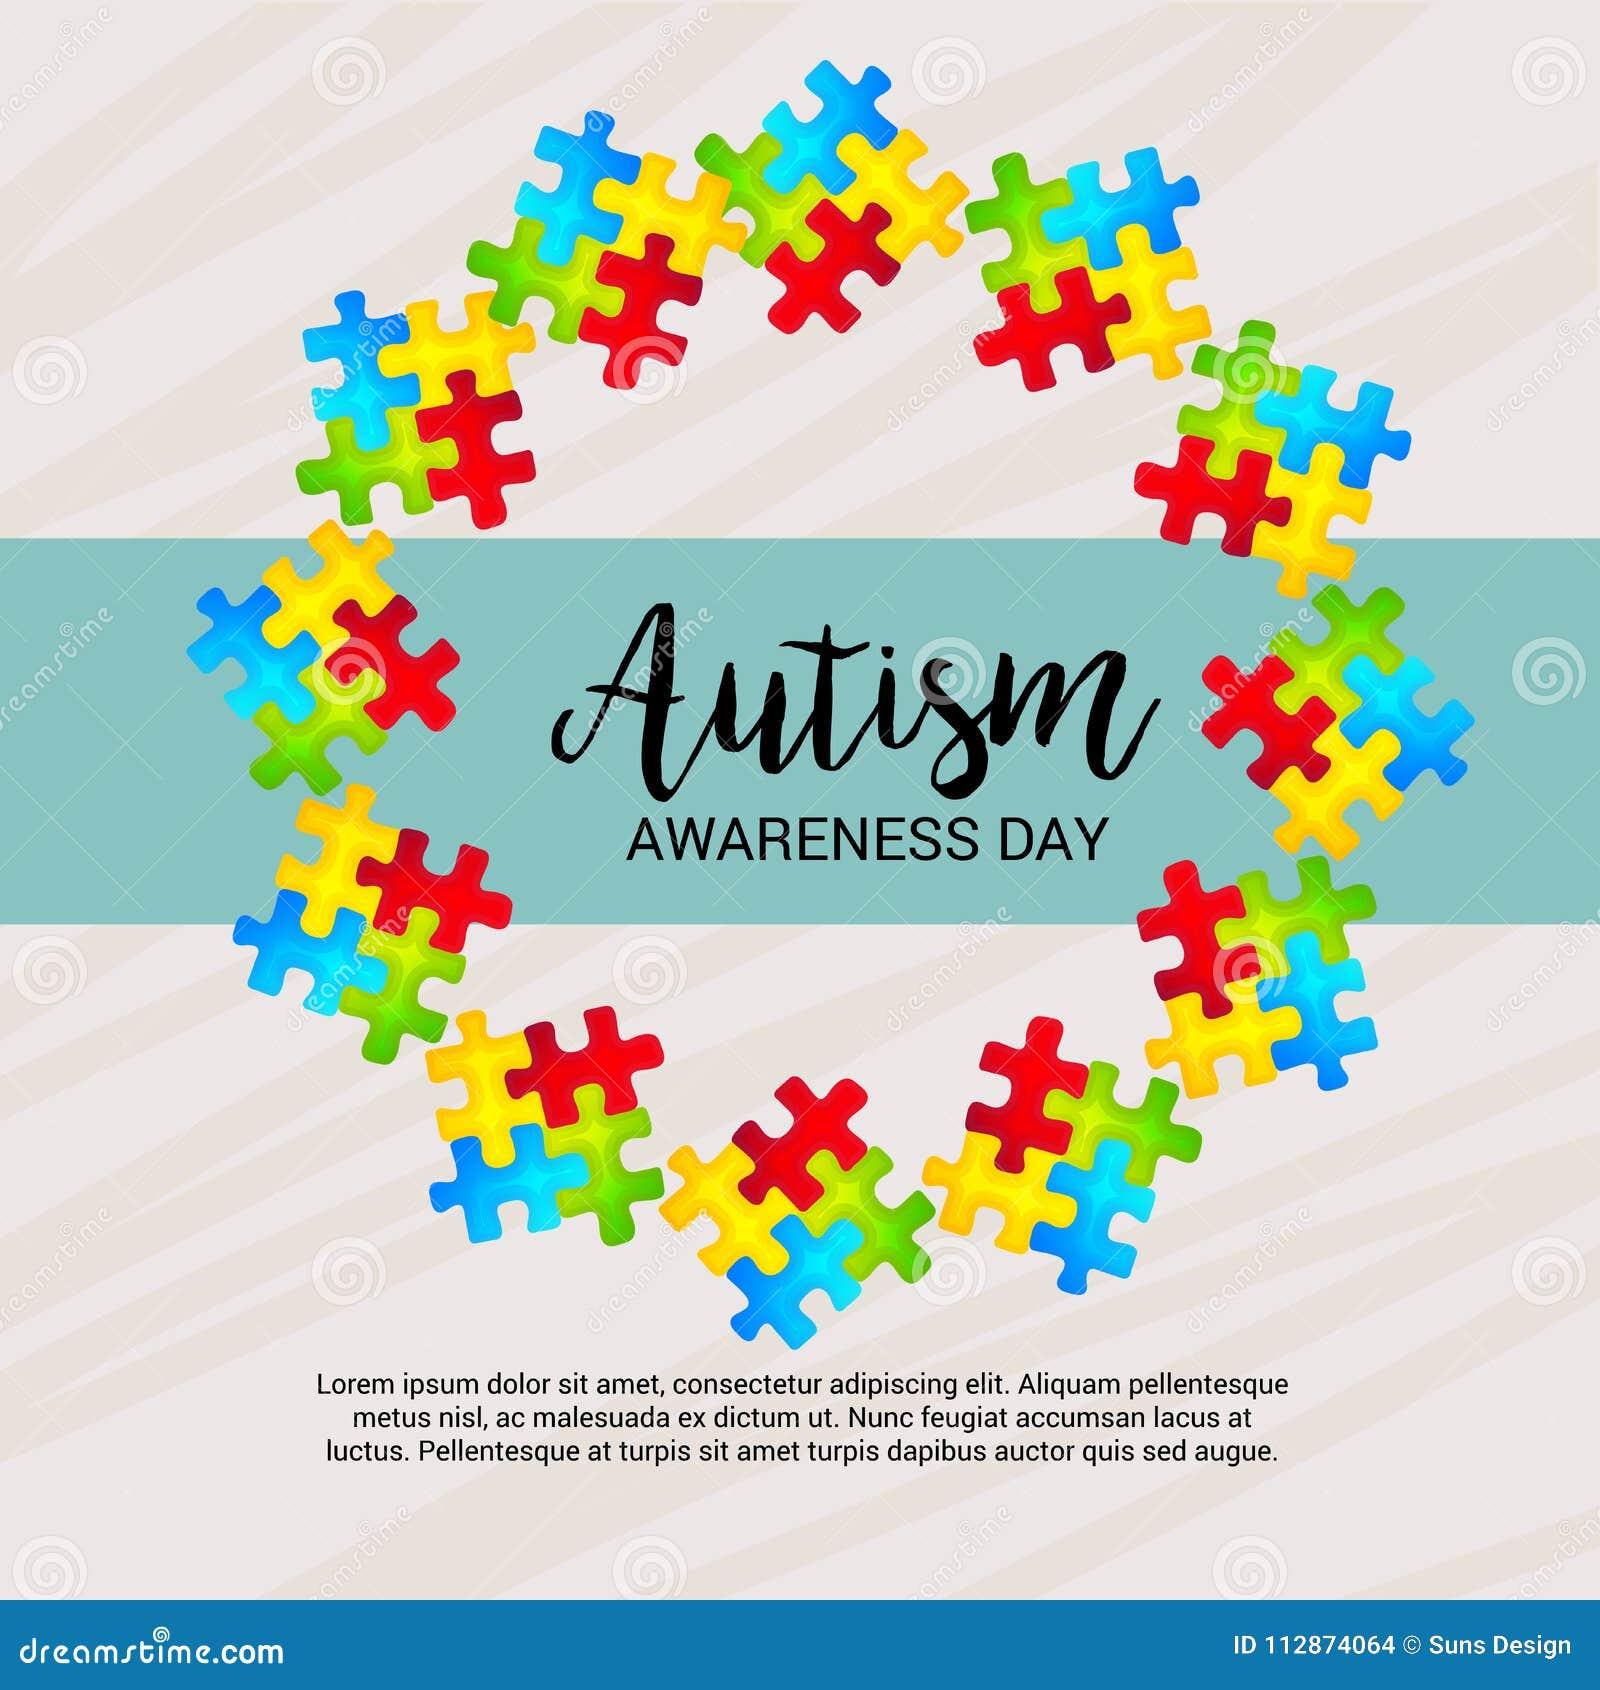 Autismusbewusstseinstag